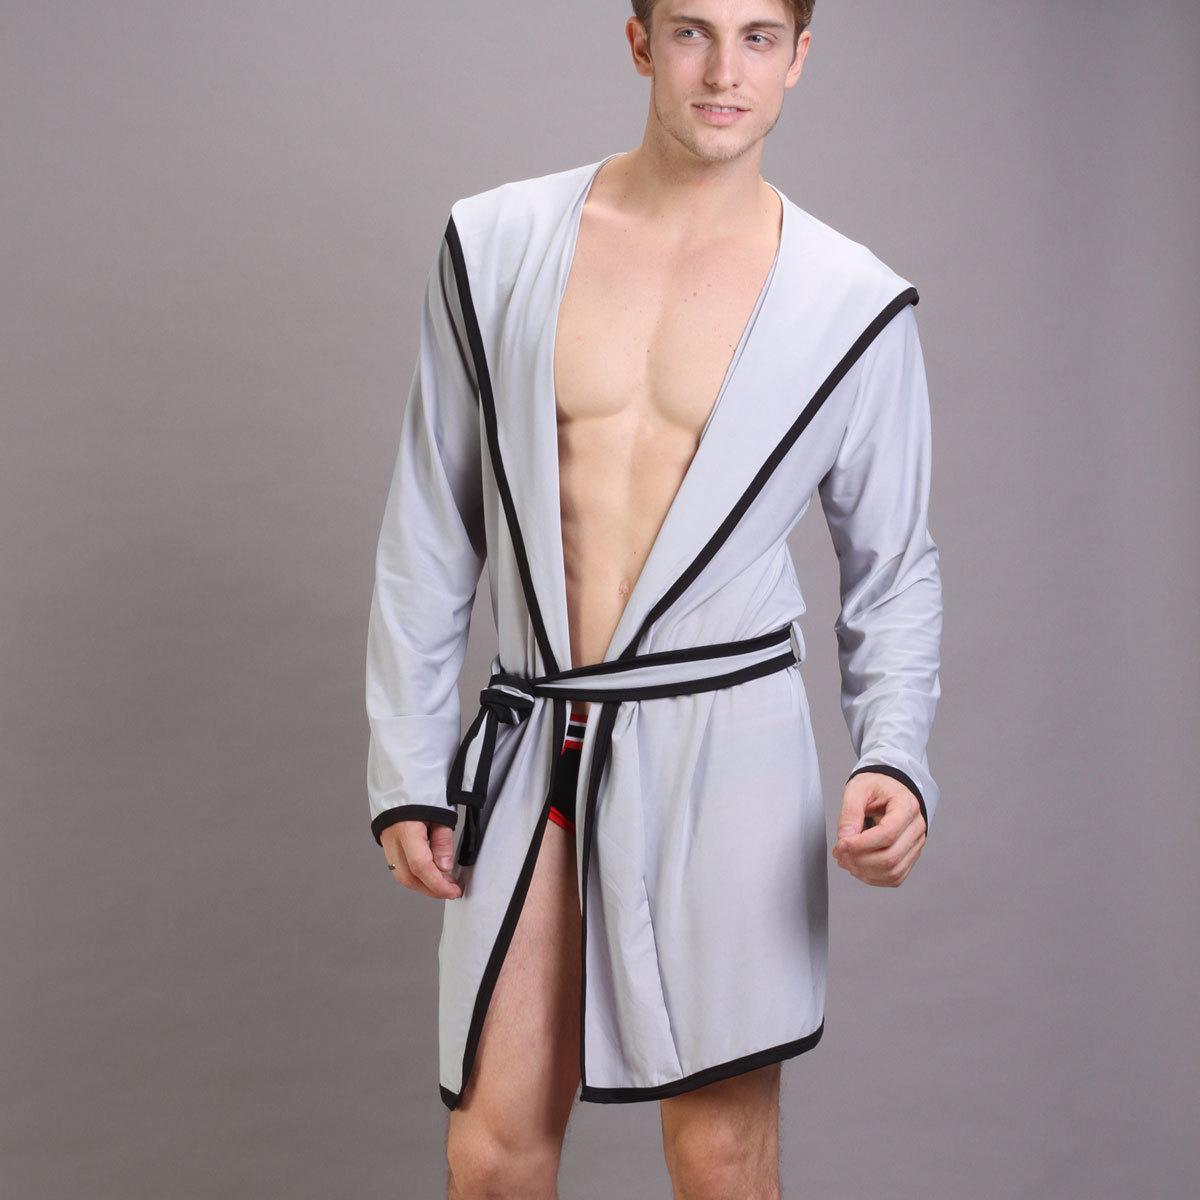 Sexy night dress for men